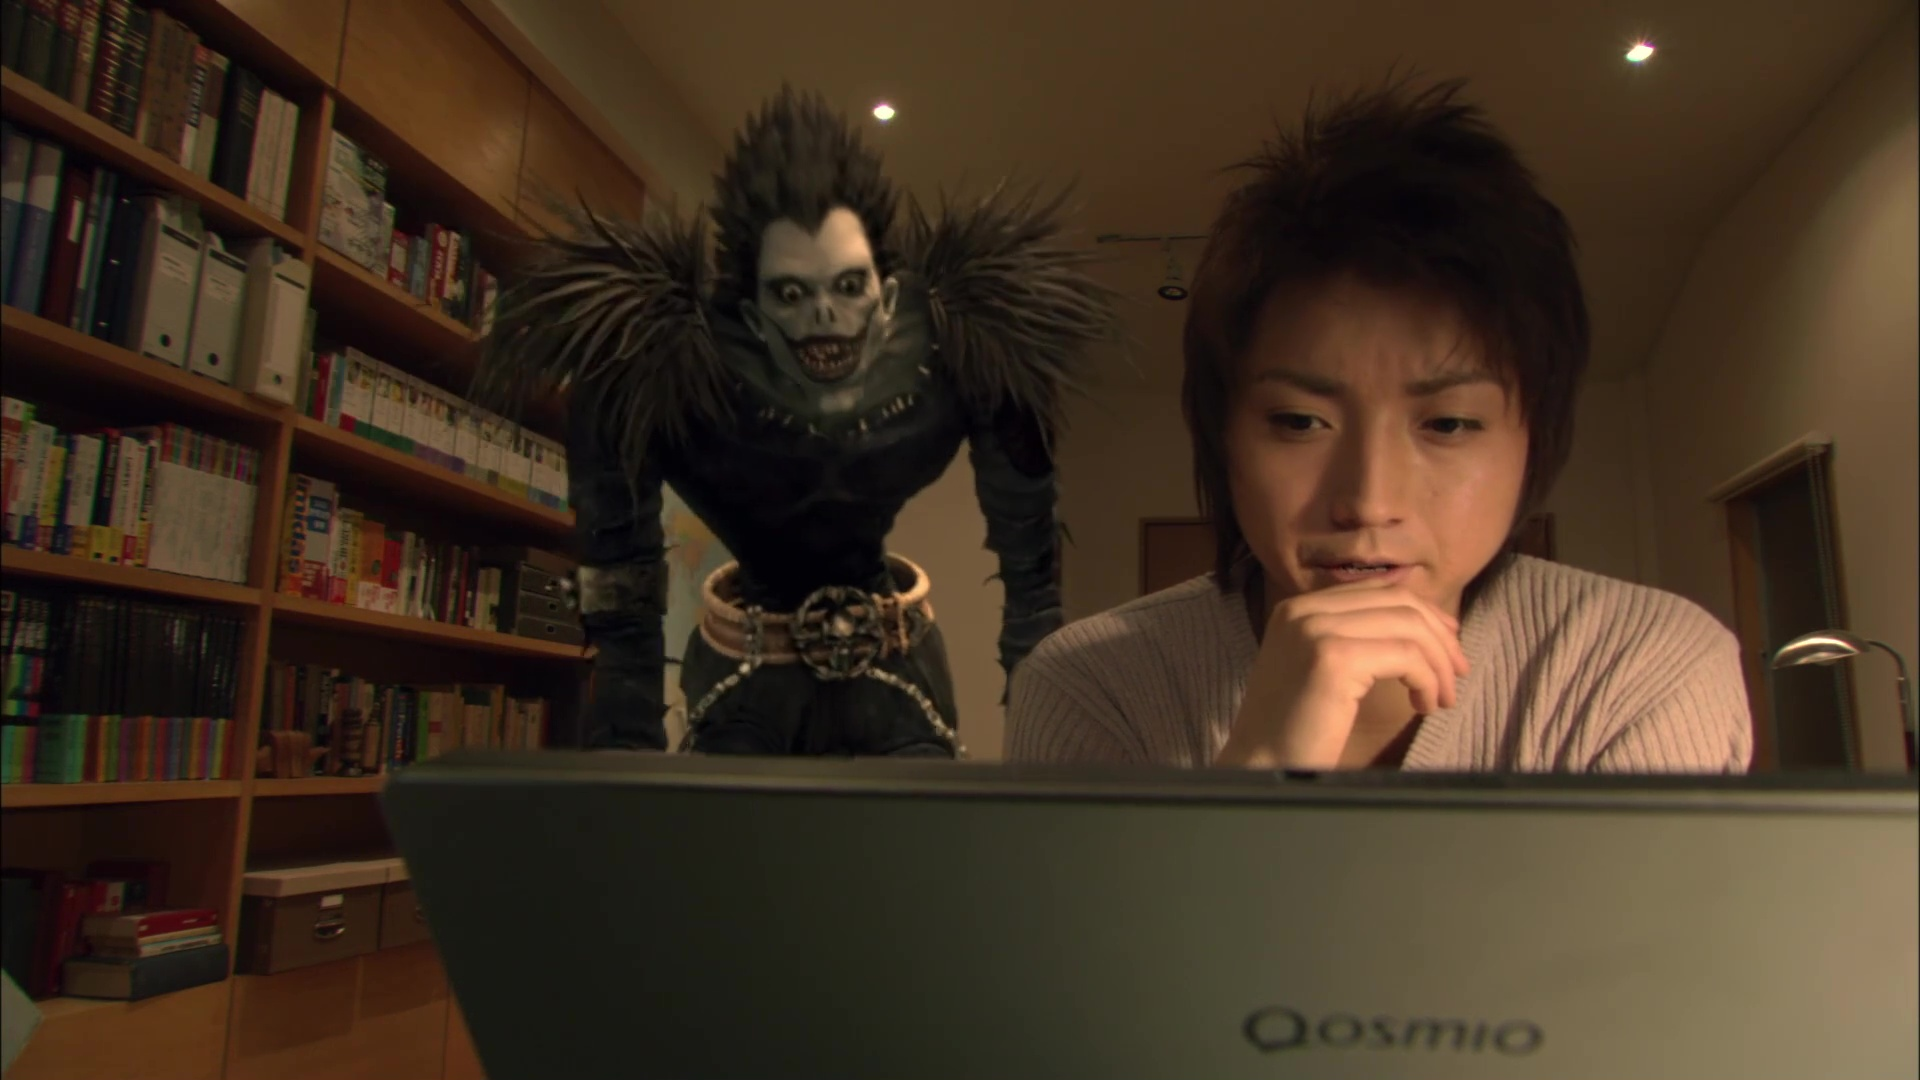 File:Death Note film- Ryuk and Light.jpg